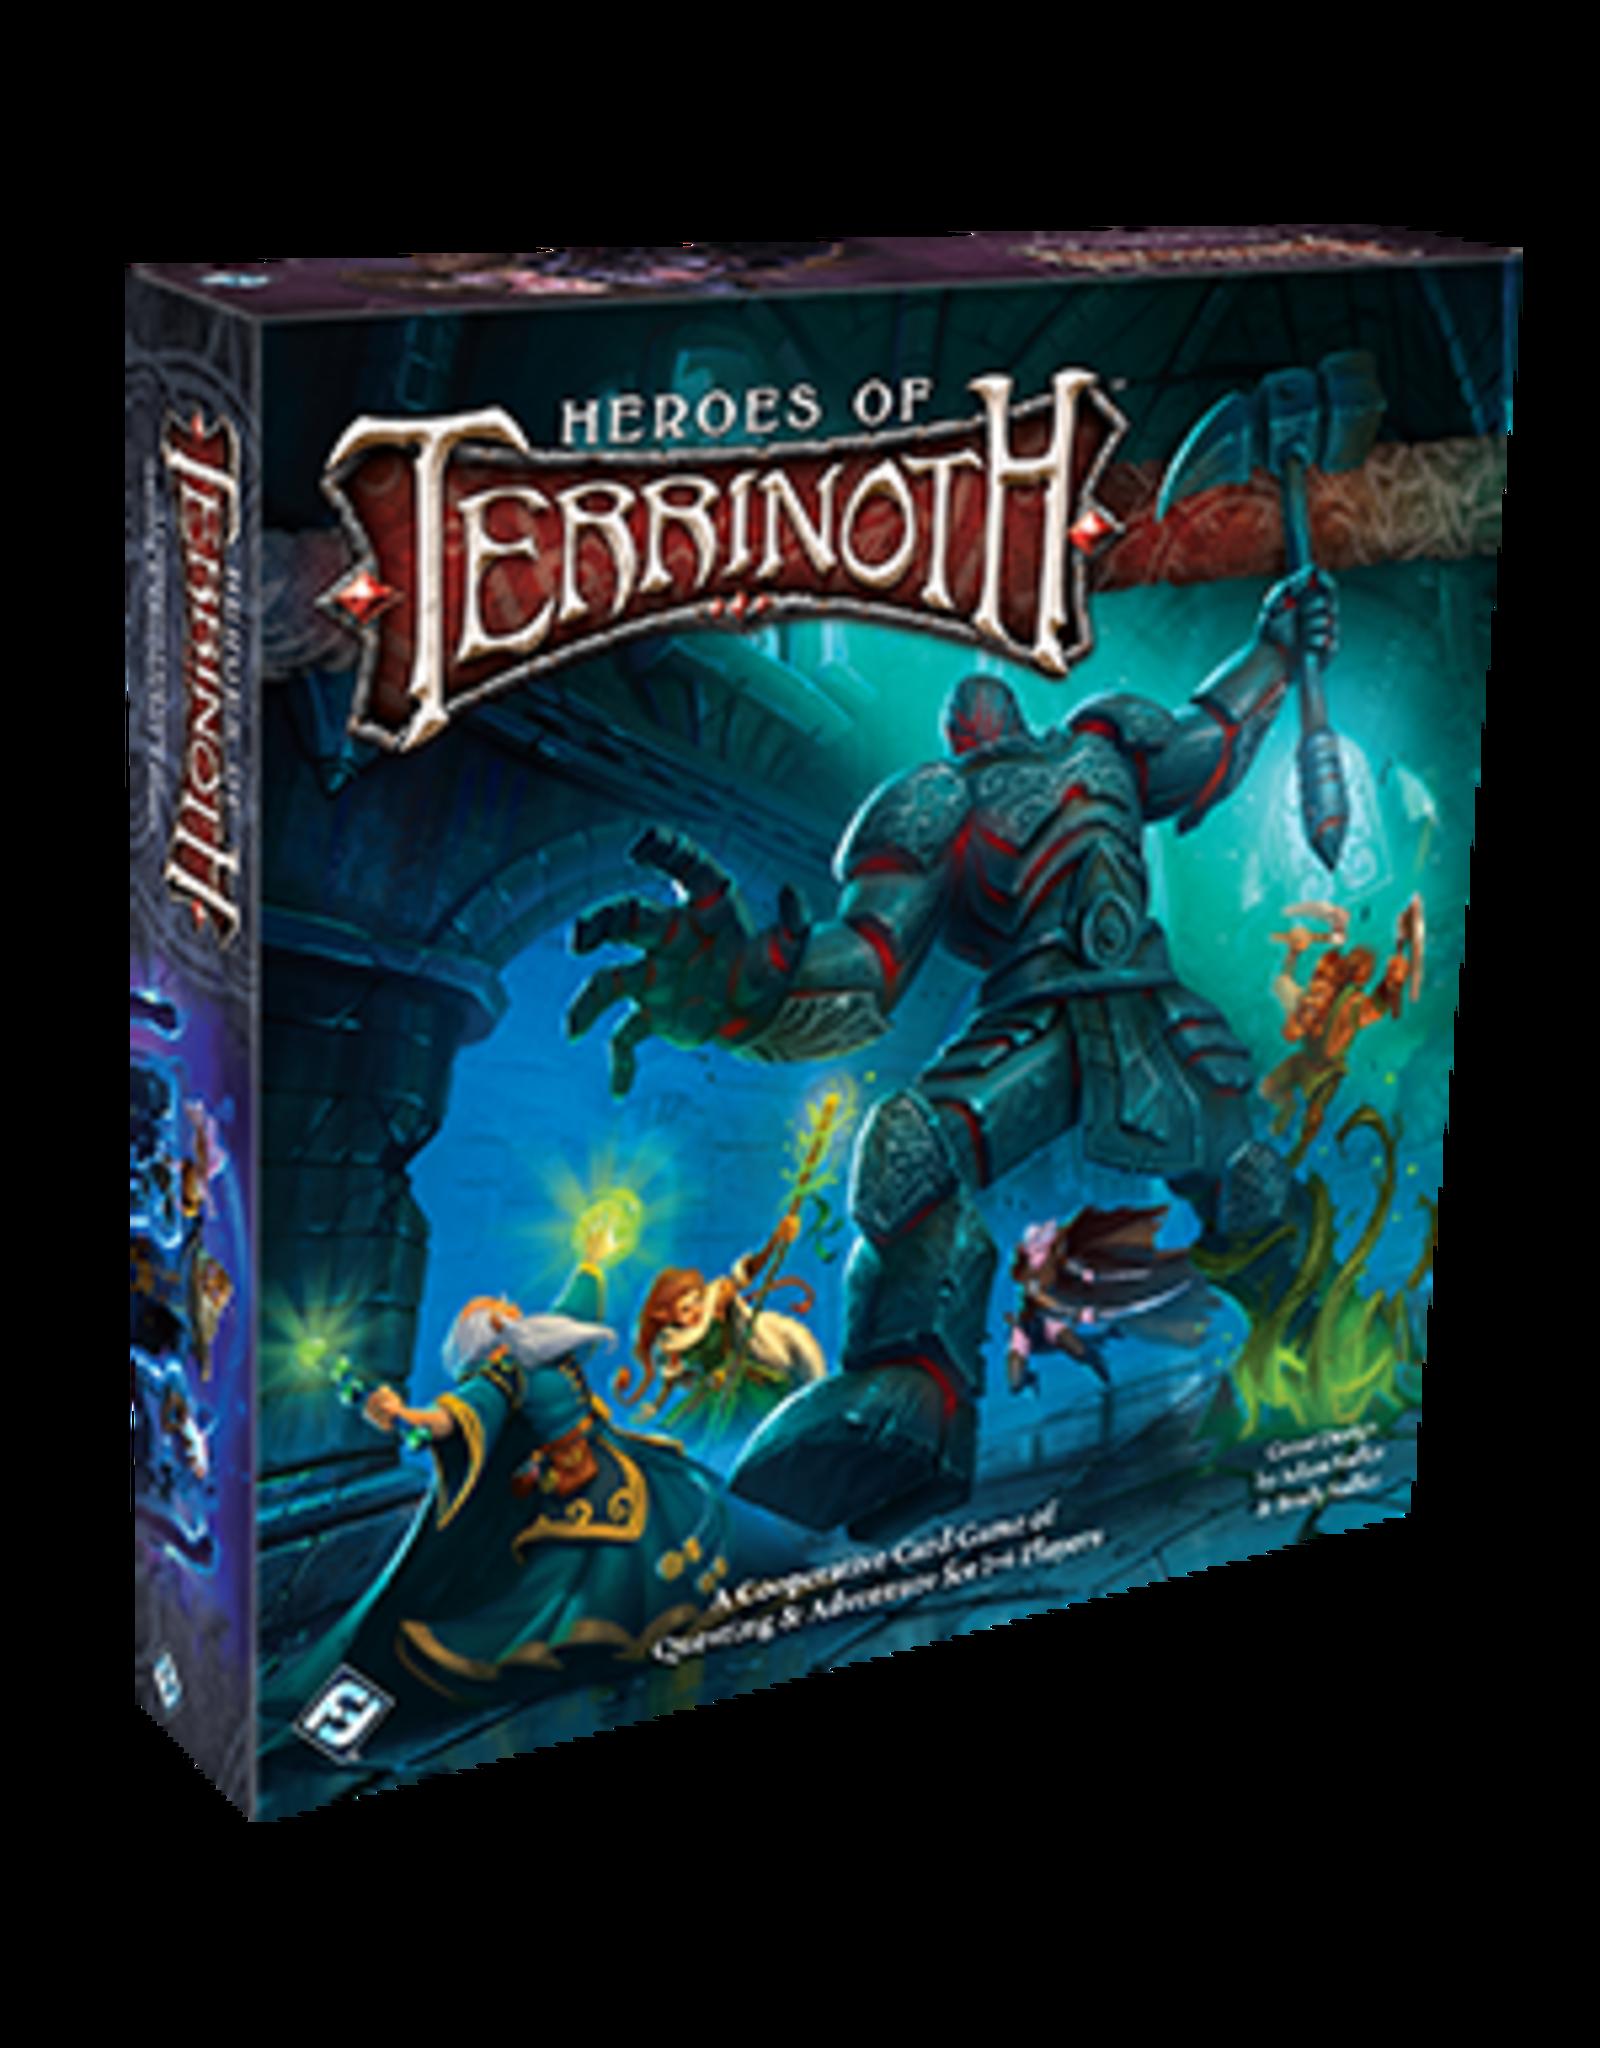 Heros of Terrinoth